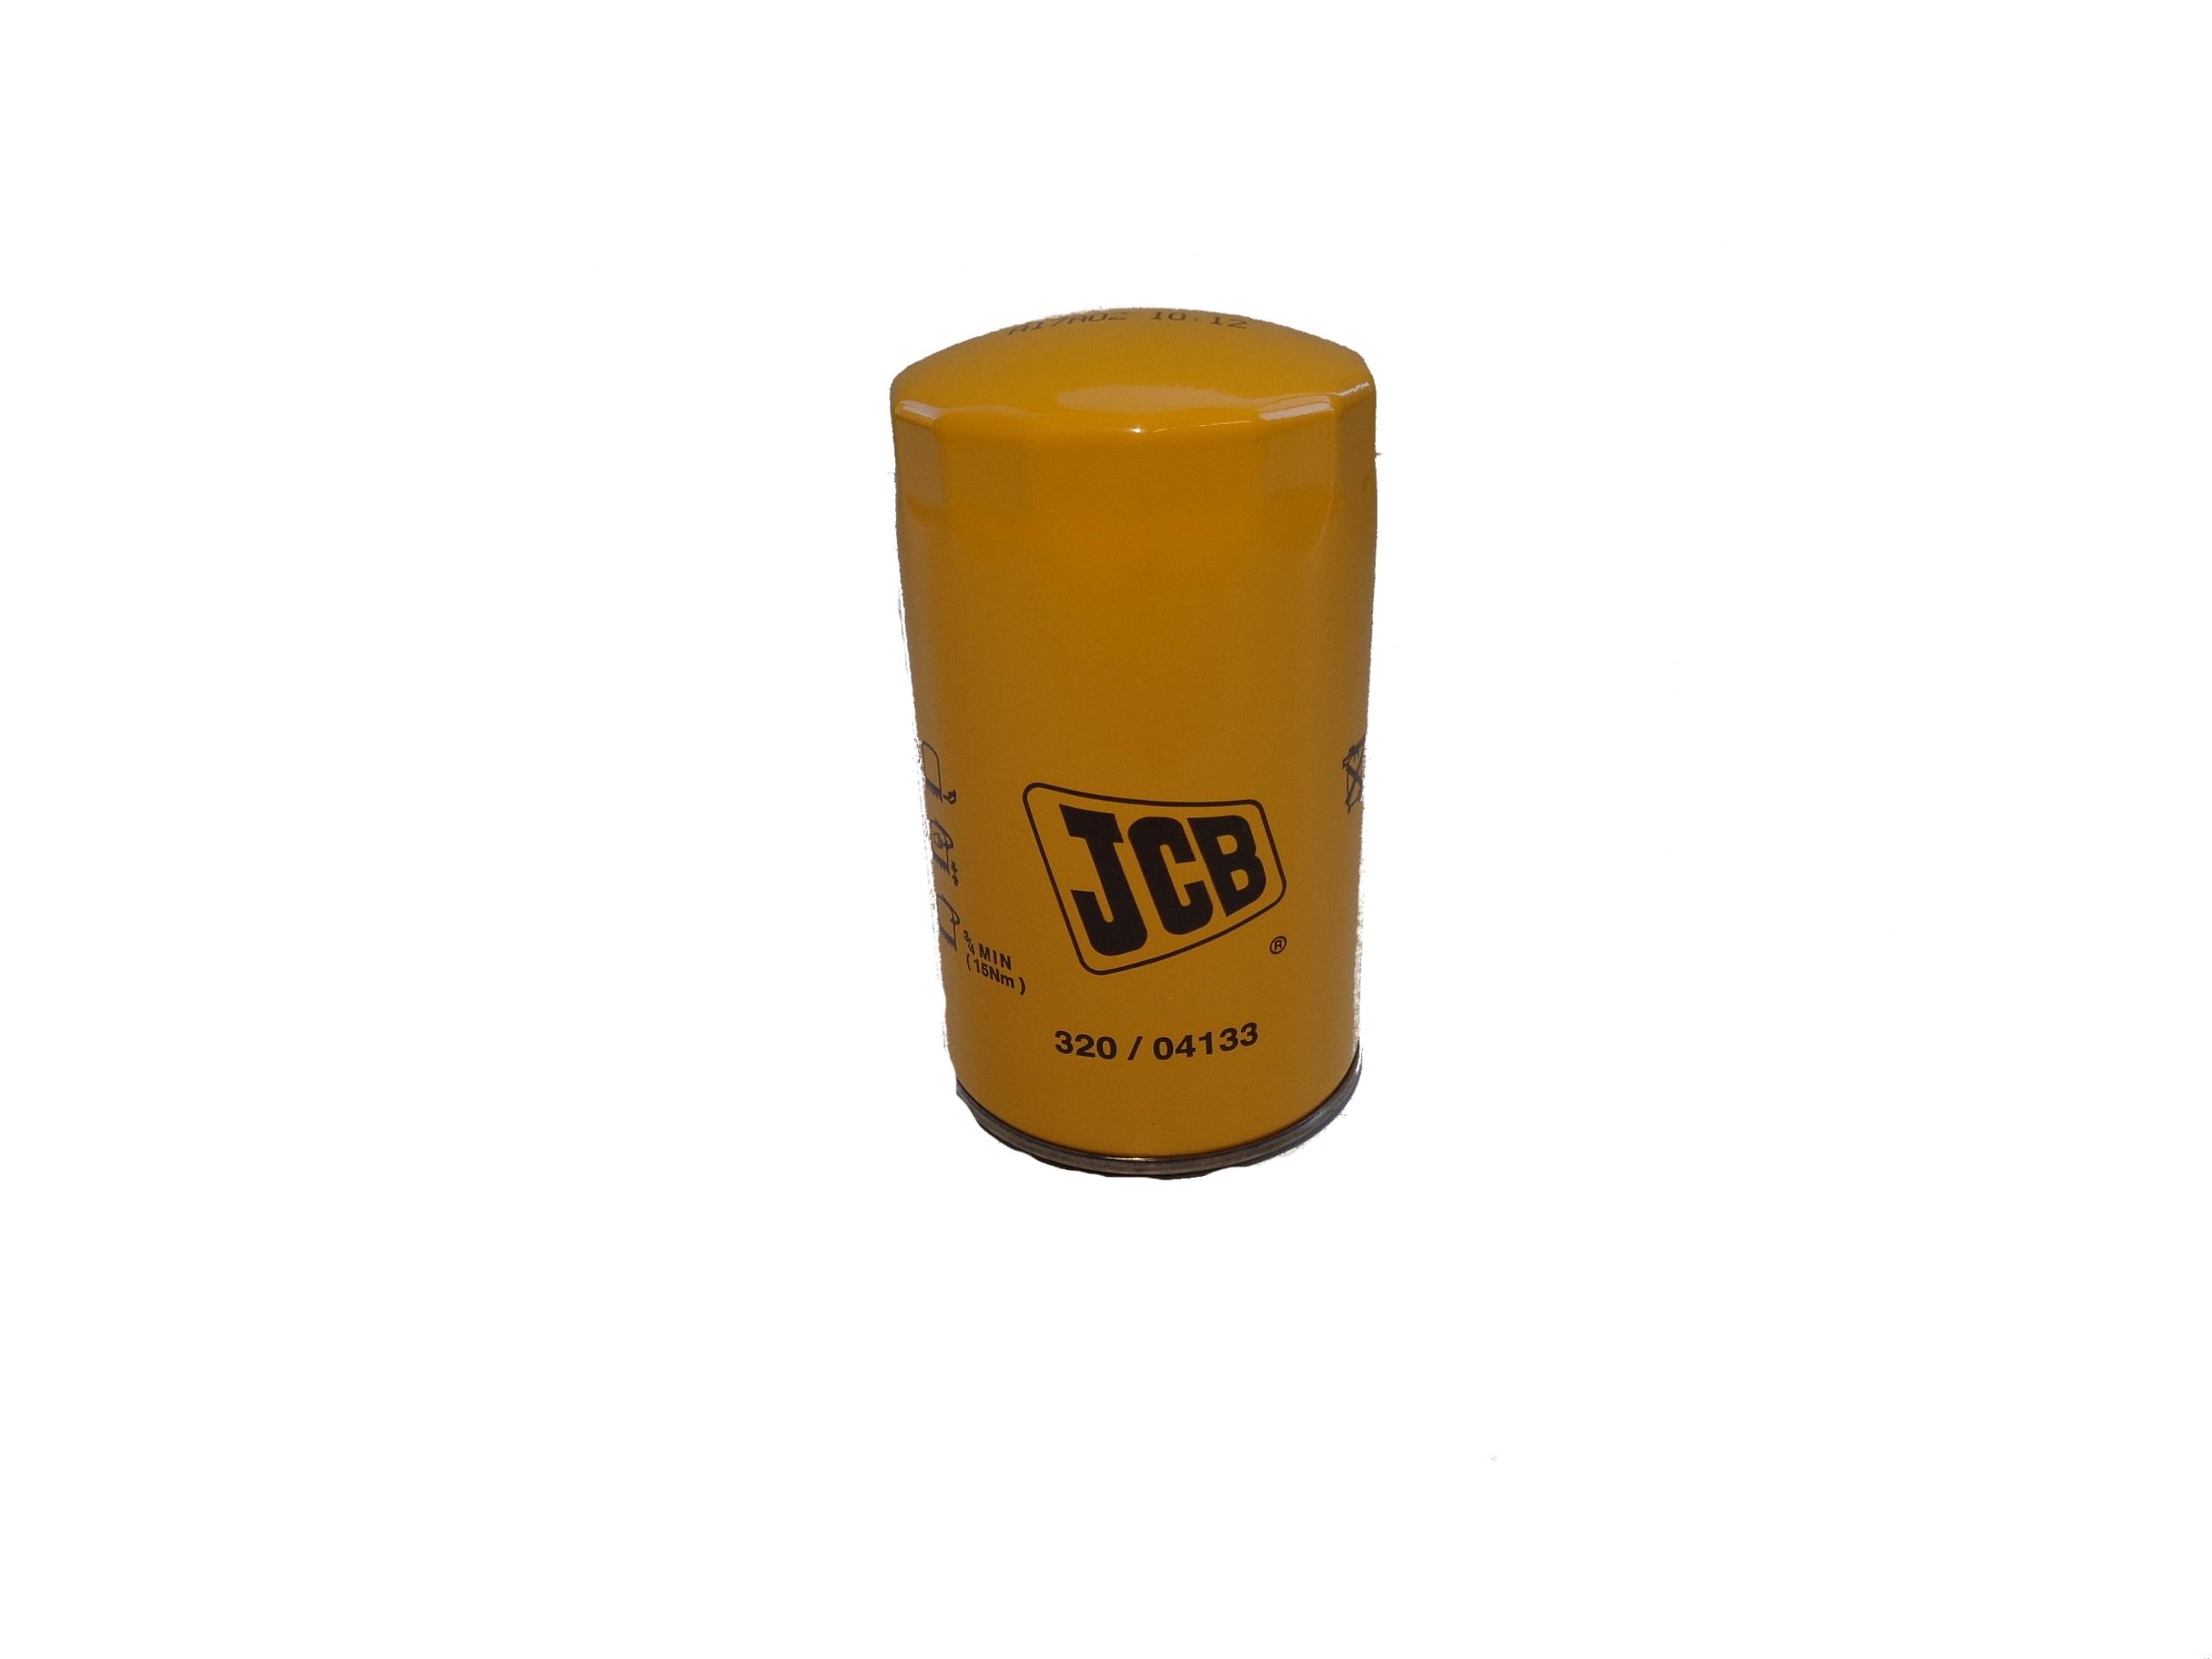 Filtr oleju silnikowego JCB 320/04133 DieselMax